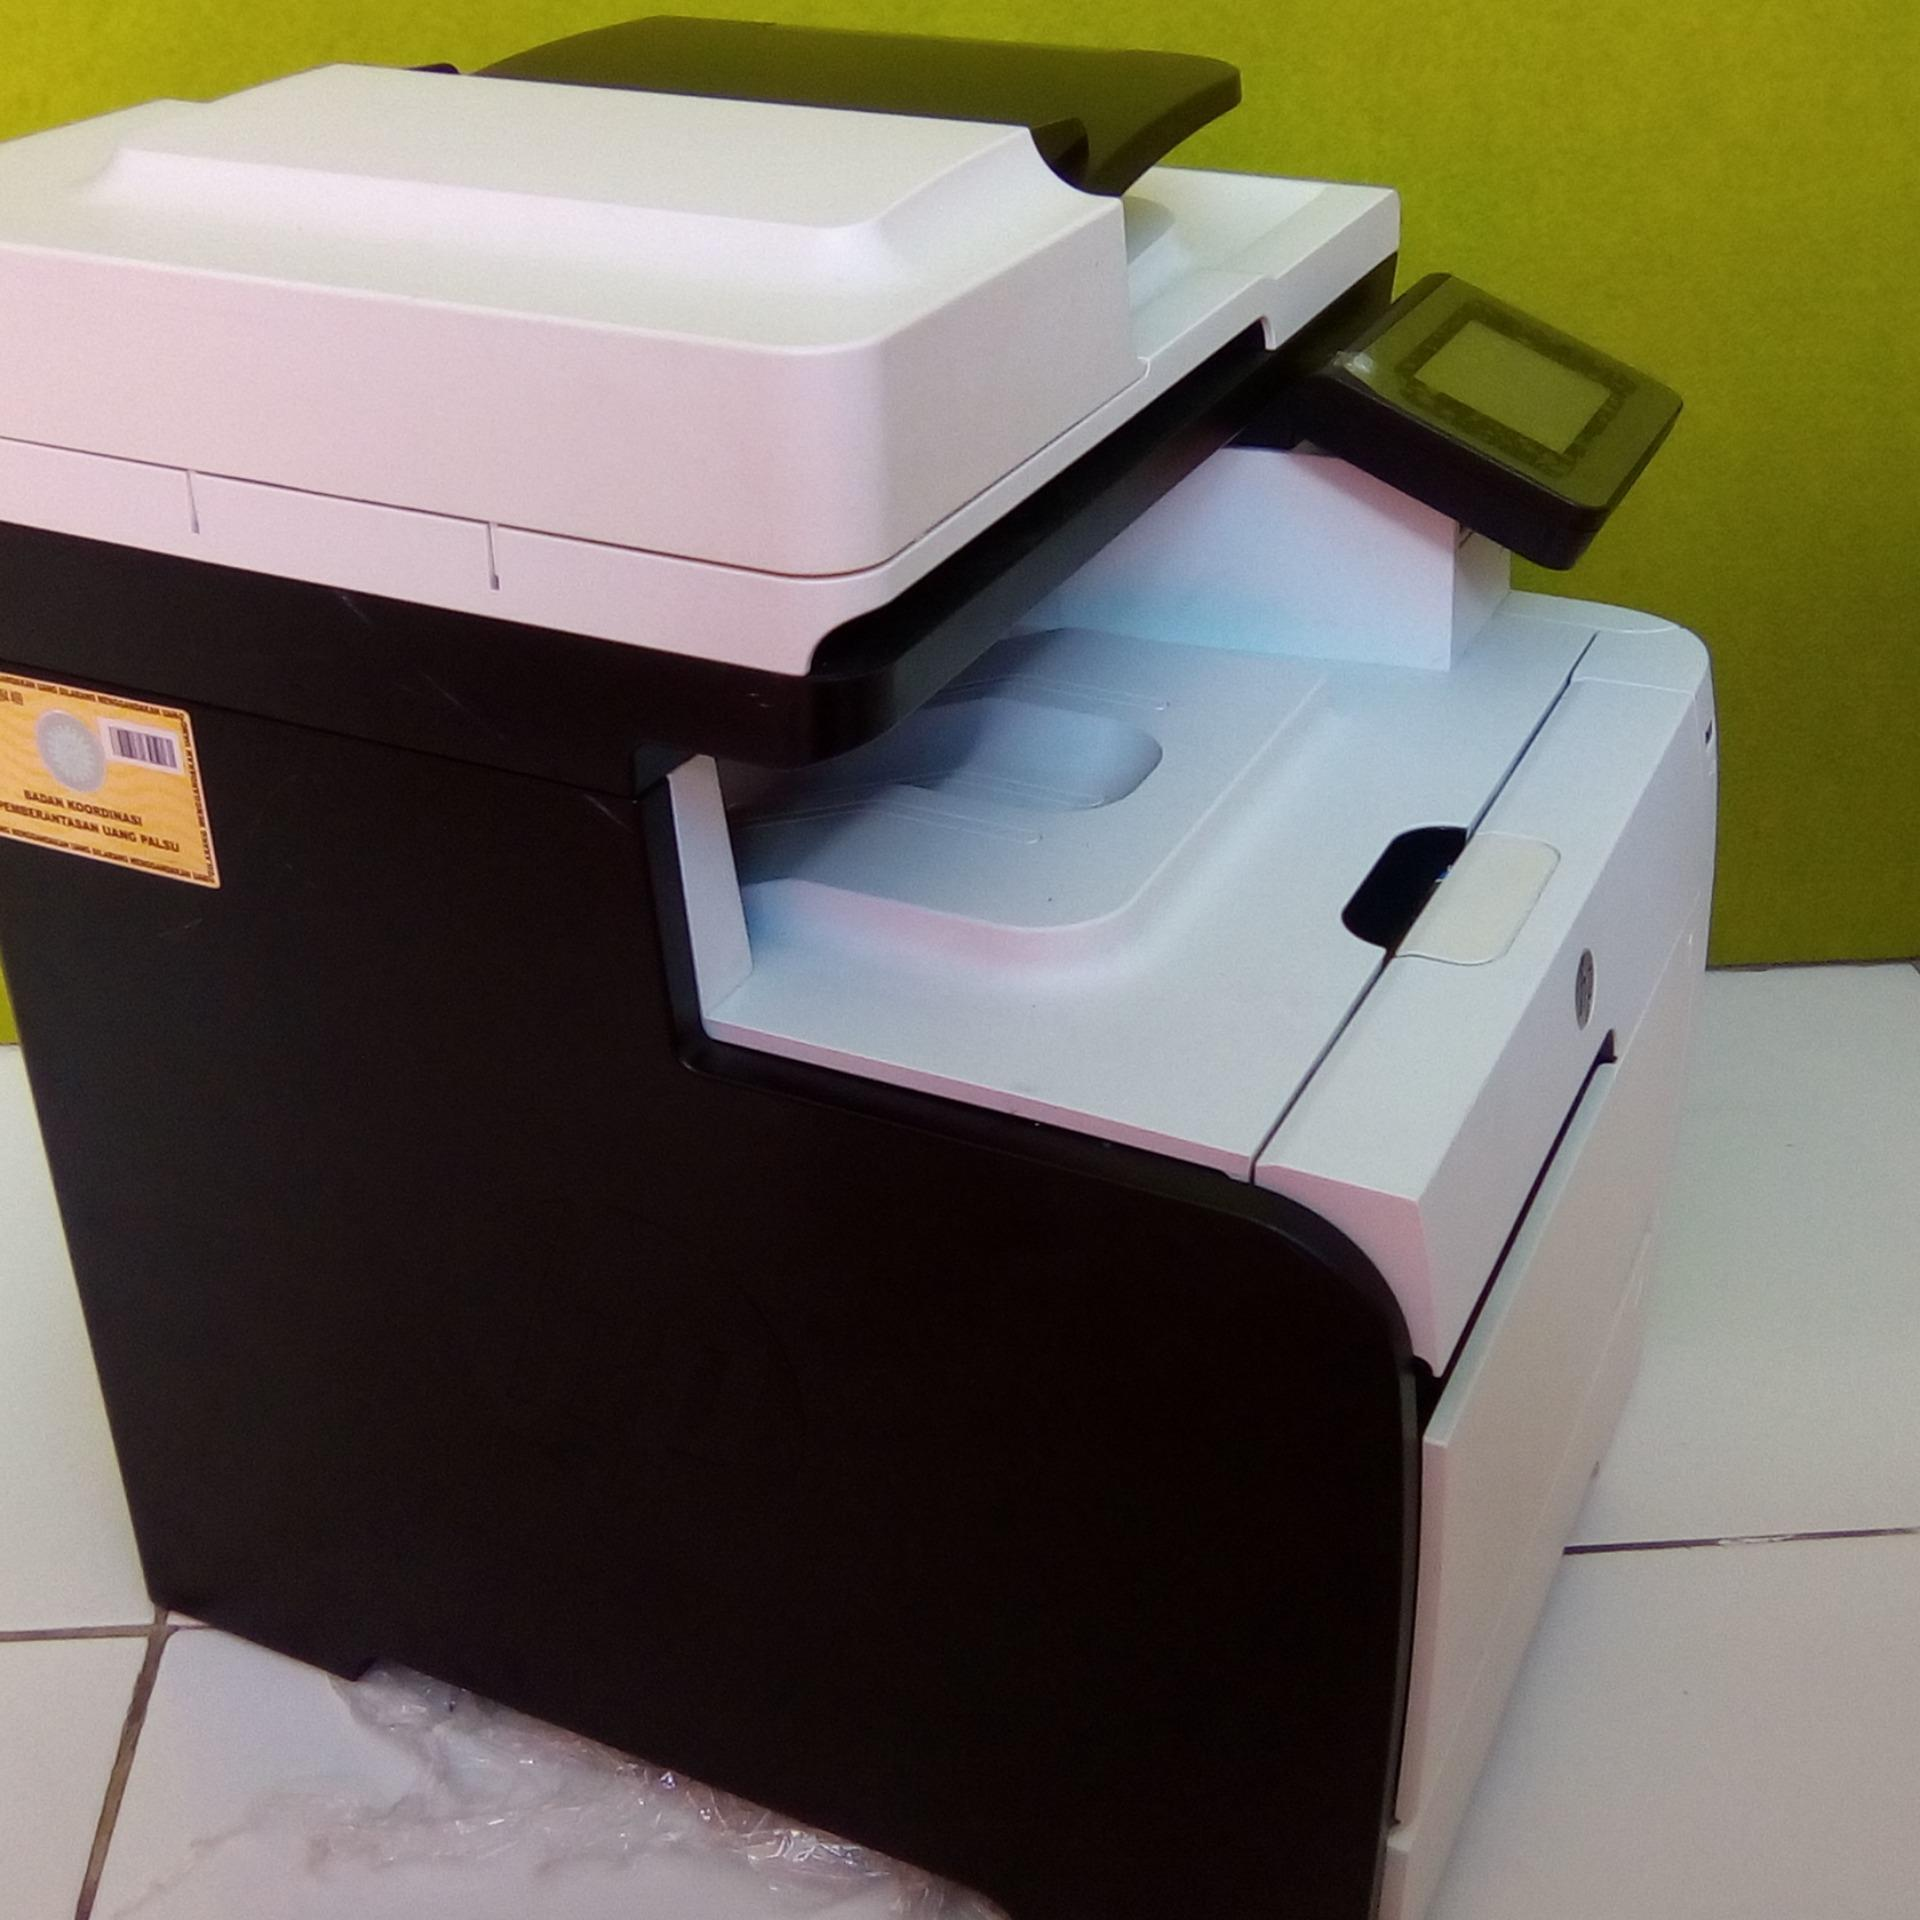 HP LaserJet Pro 400 color MFP M475 .